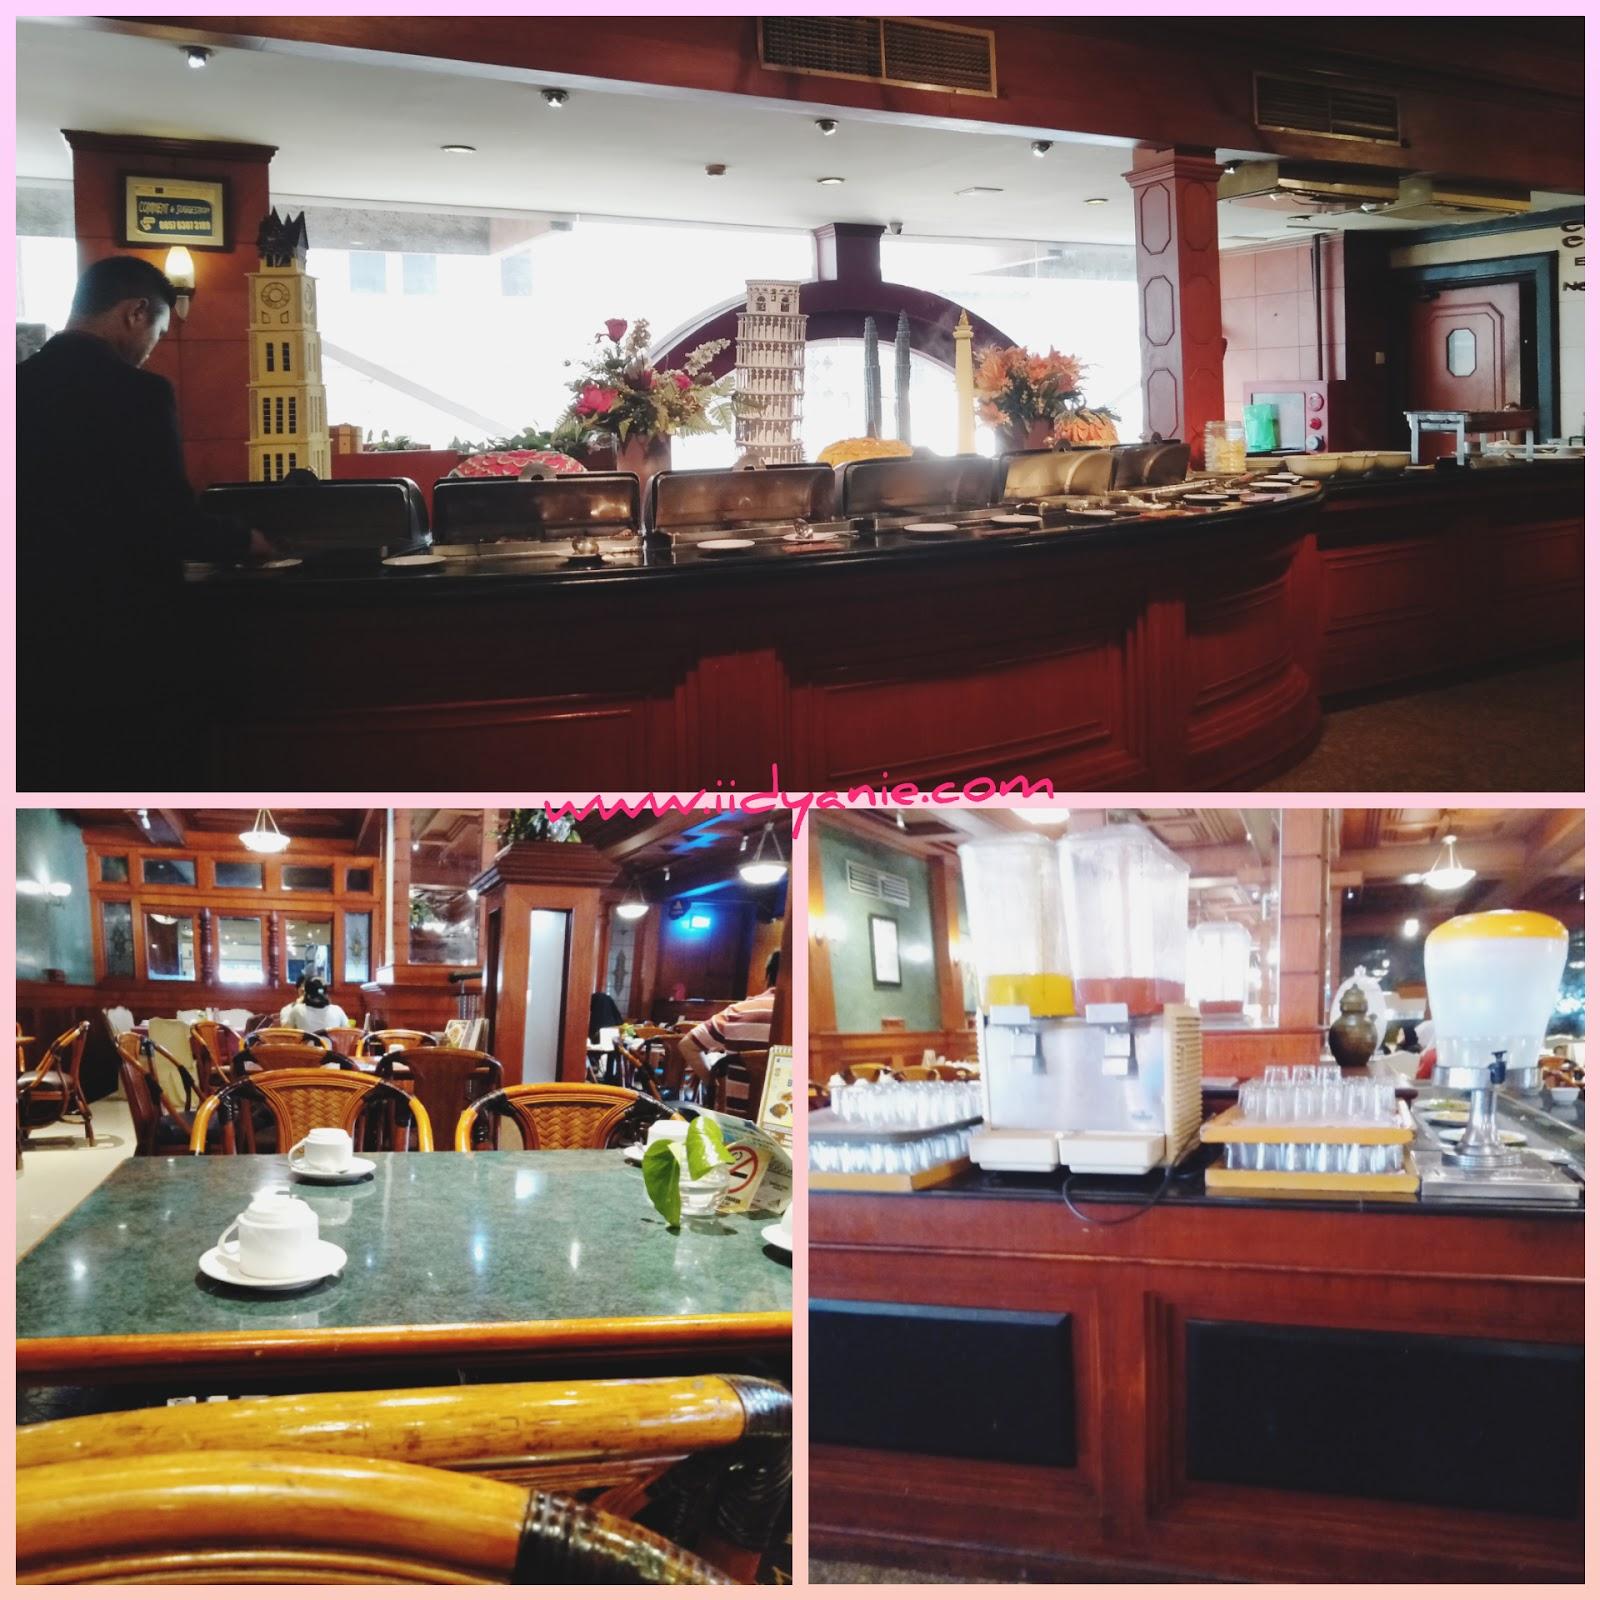 kimcu restaurant soechi international medan